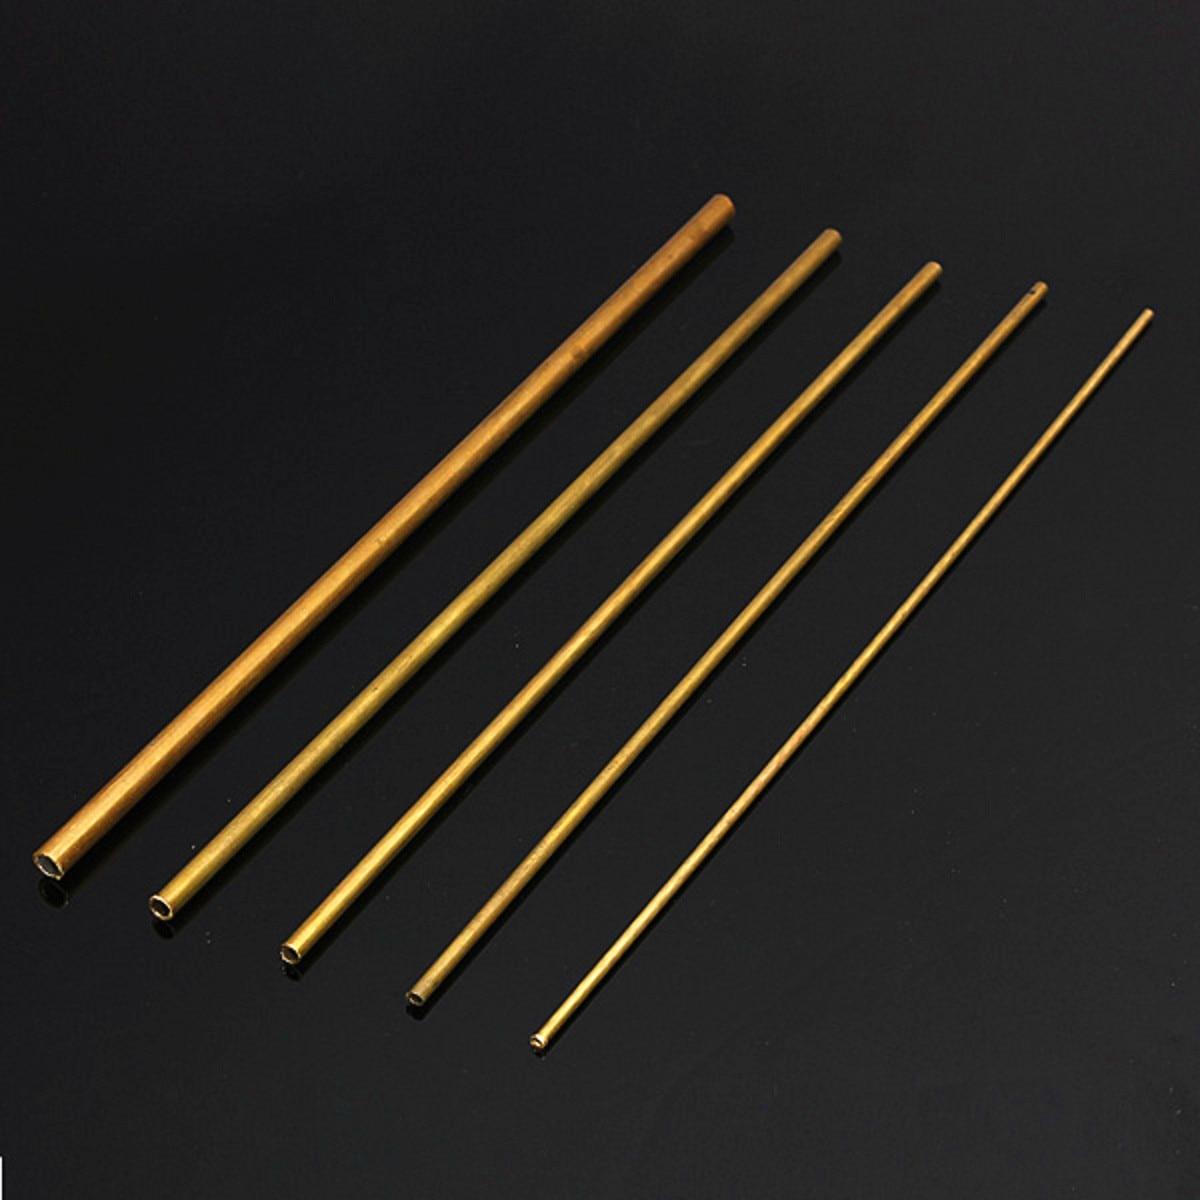 Brass Tube Pipe Model Tubing Round Inner 2mm 3mm 4mm 5mm Long 300mm Wall 0.5mm